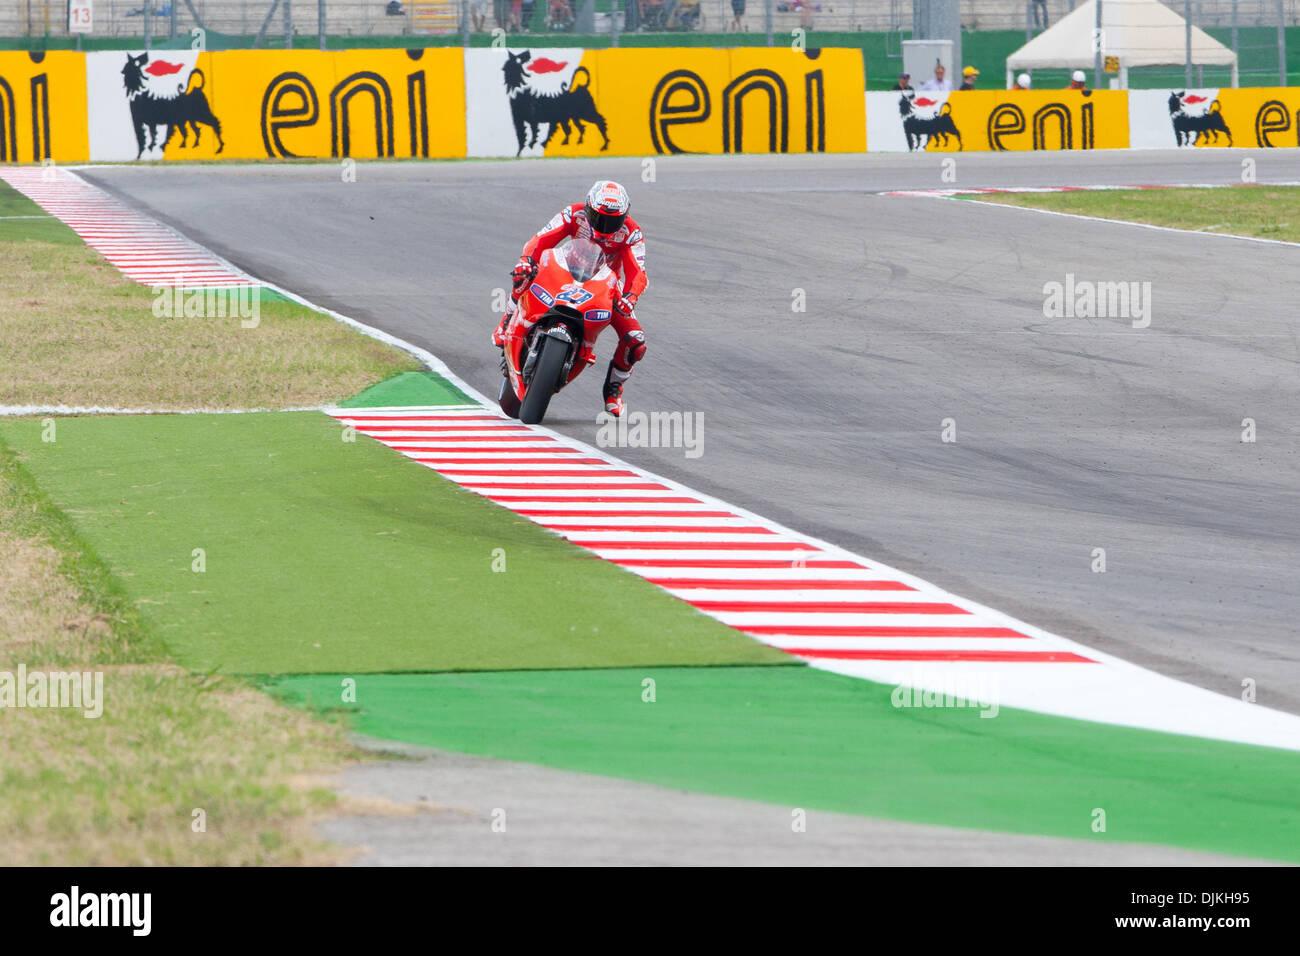 Sep. 07, 2010 - Misano Adriatico, Italy - Ducati rider Casey Stoner in the 4th place of the San Marino GP in Misano Adriatico, Italy. (Credit Image: © Andrea Ranalli/Southcreek Global/ZUMApress.com) - Stock Image